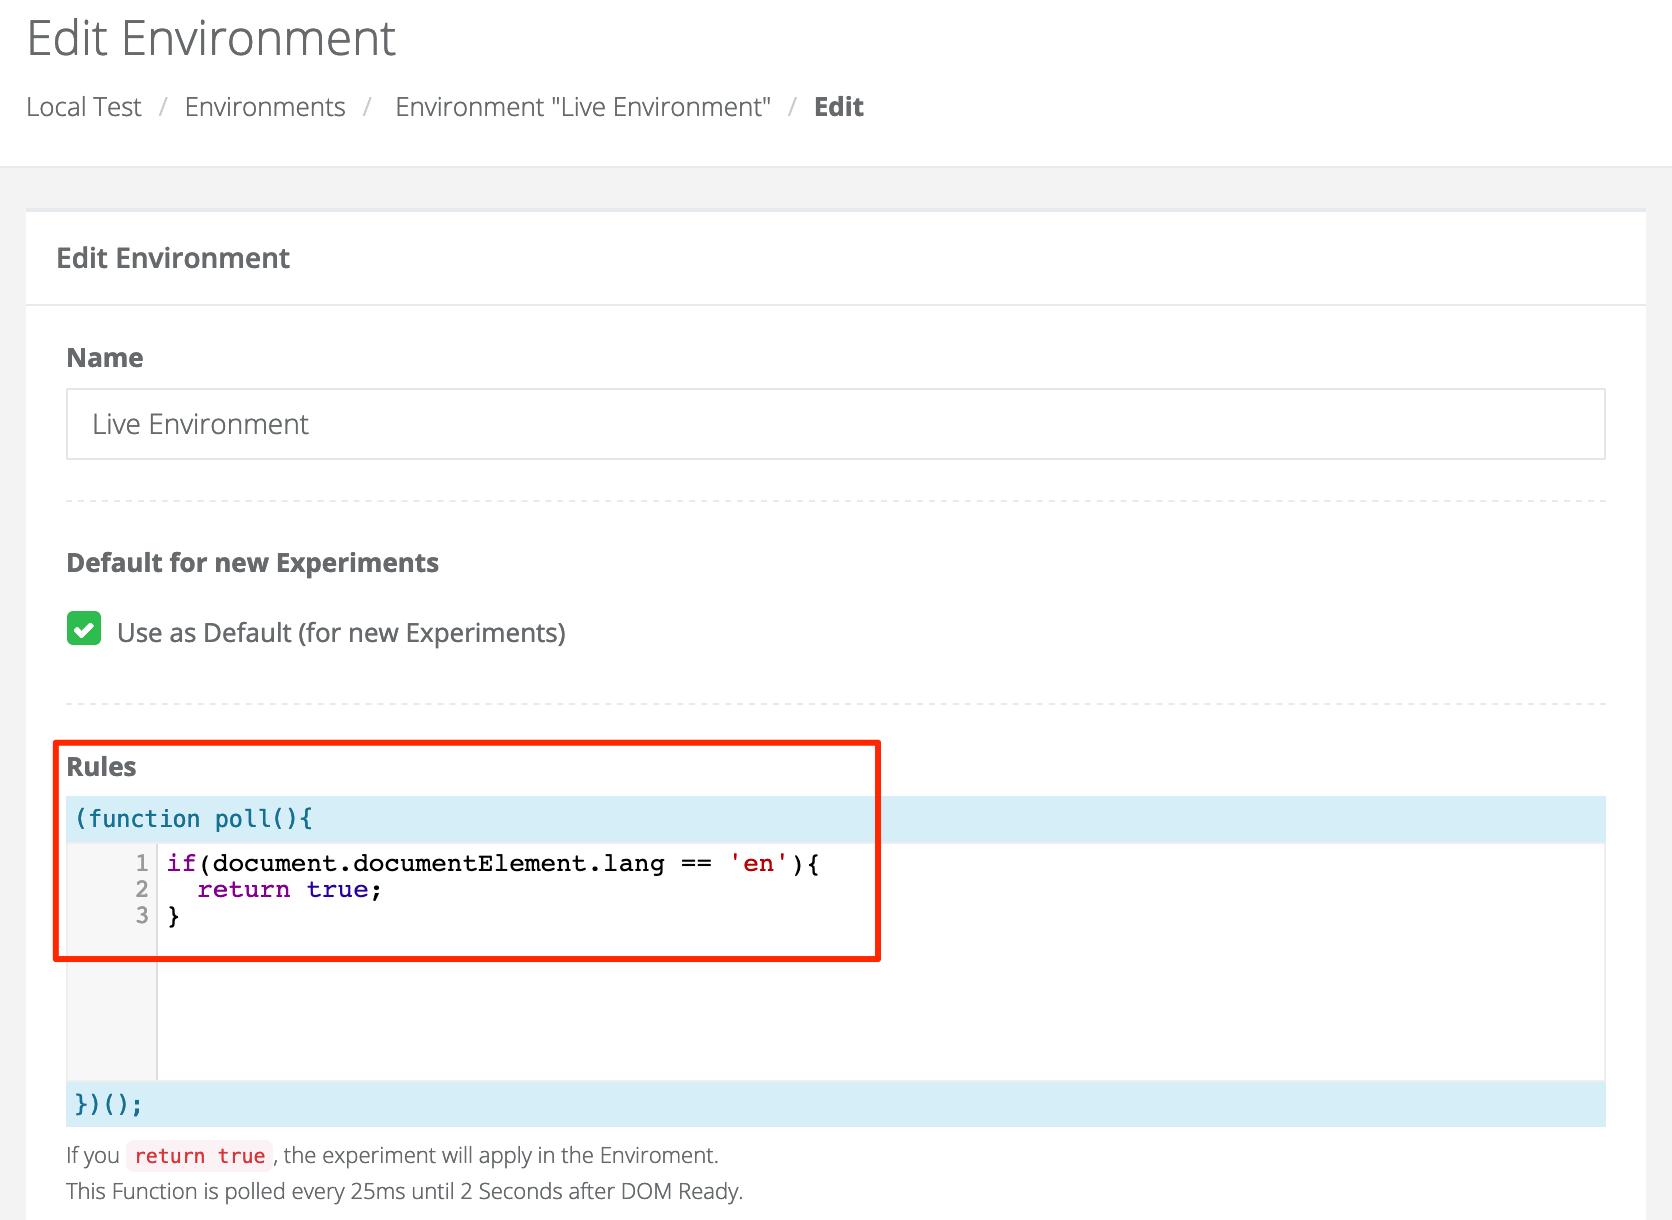 ablyft-environments-edit-code